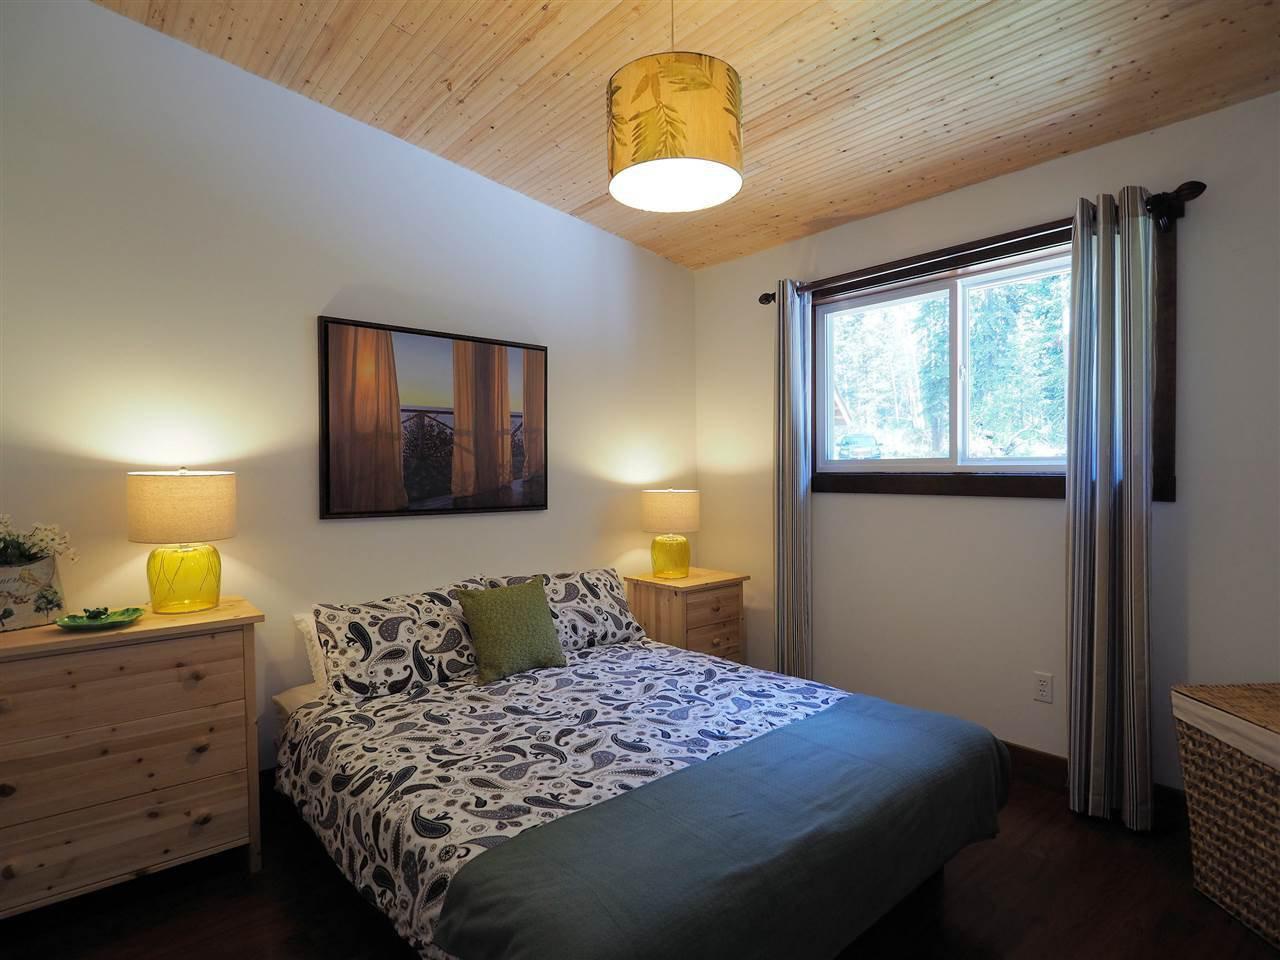 Photo 16: Photos: 8222 CENTENNIAL Road in Bridge Lake: Bridge Lake/Sheridan Lake House for sale (100 Mile House (Zone 10))  : MLS®# R2457362